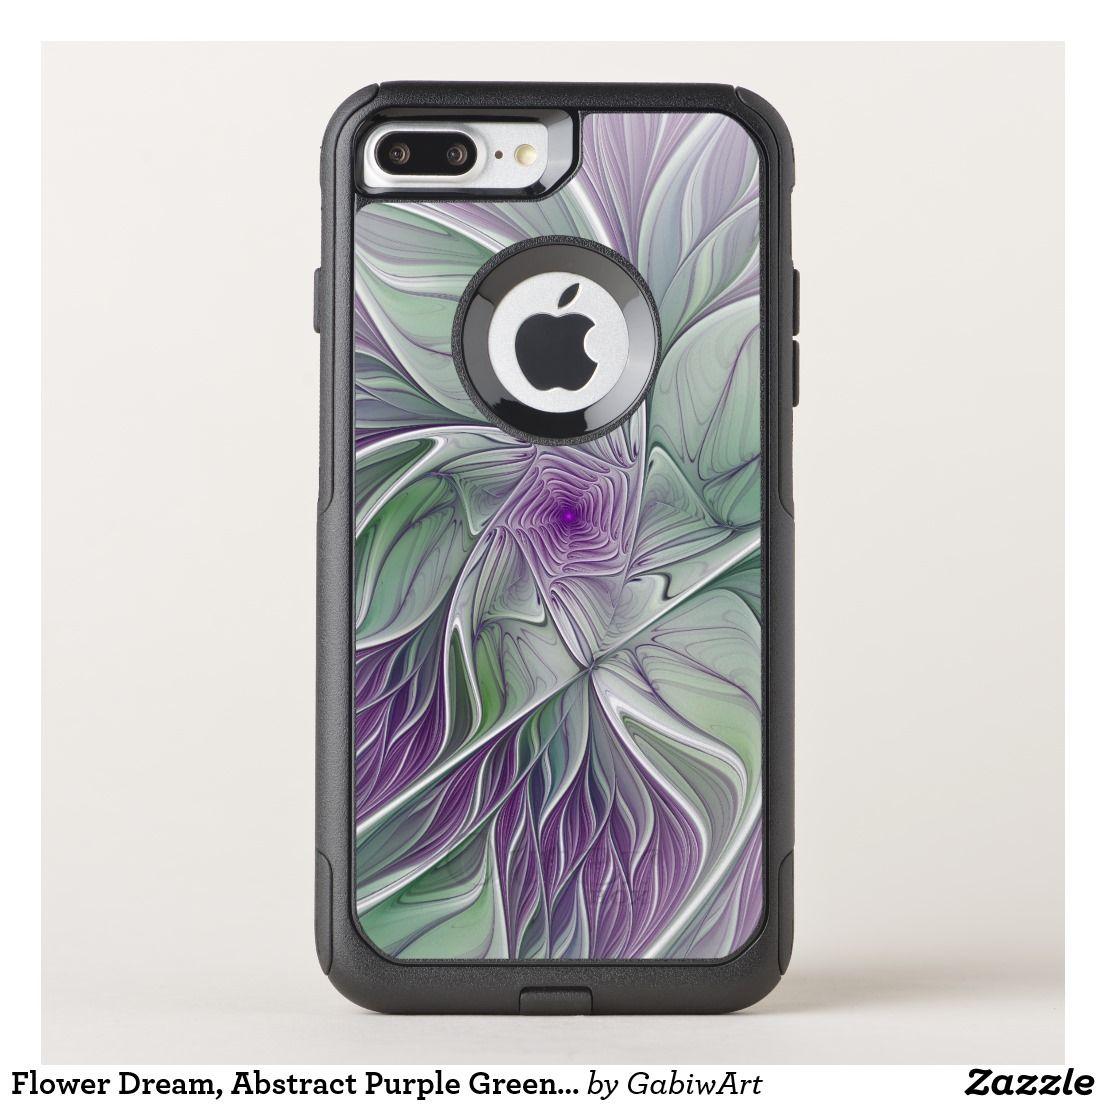 Flower dream abstract purple green fractal art otterbox